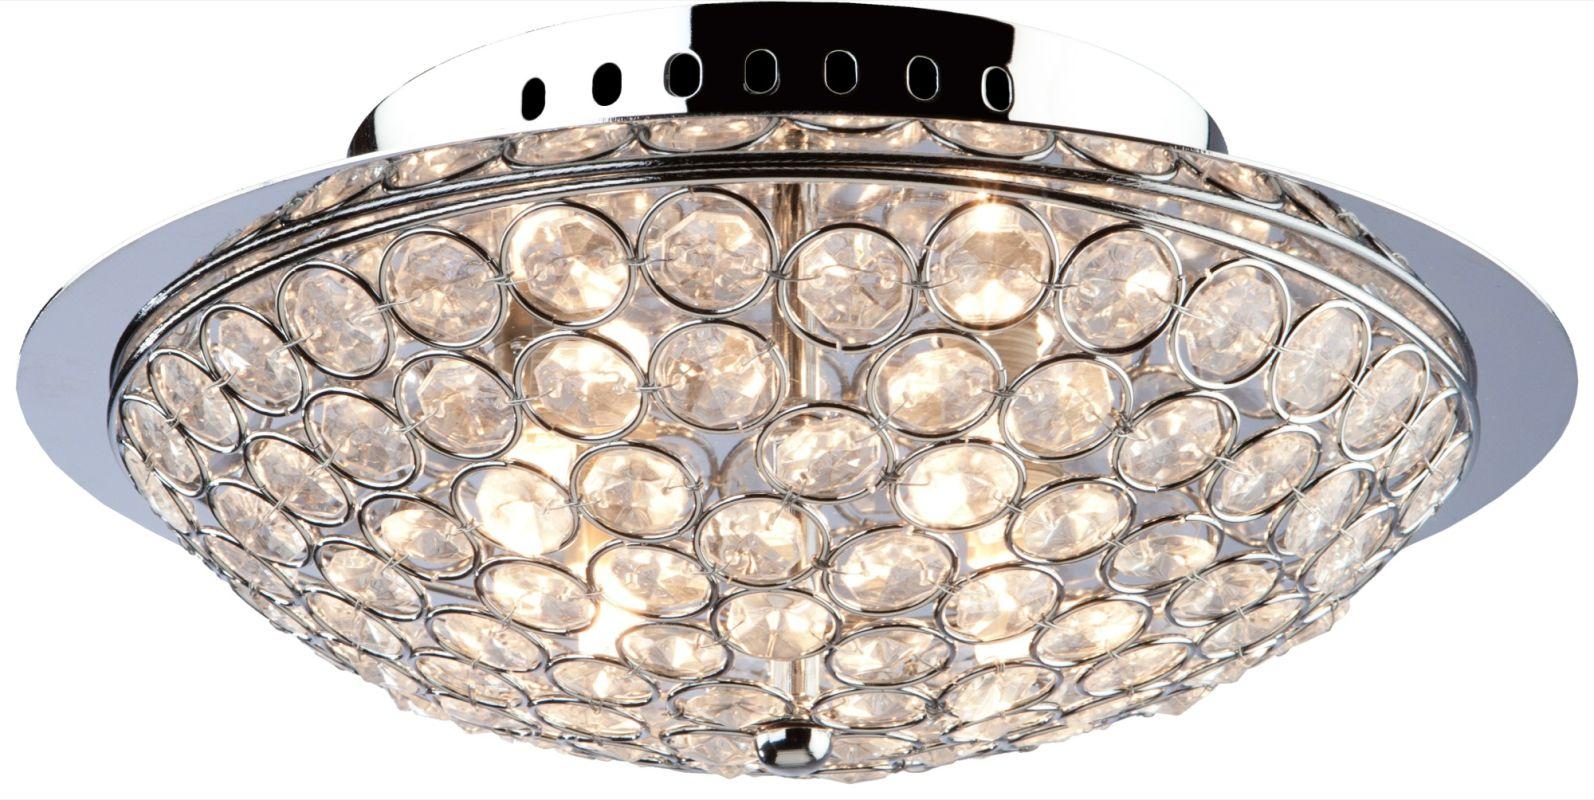 Artcraft Lighting AC10100 Gage Park 3 Light Flush Mount Ceiling